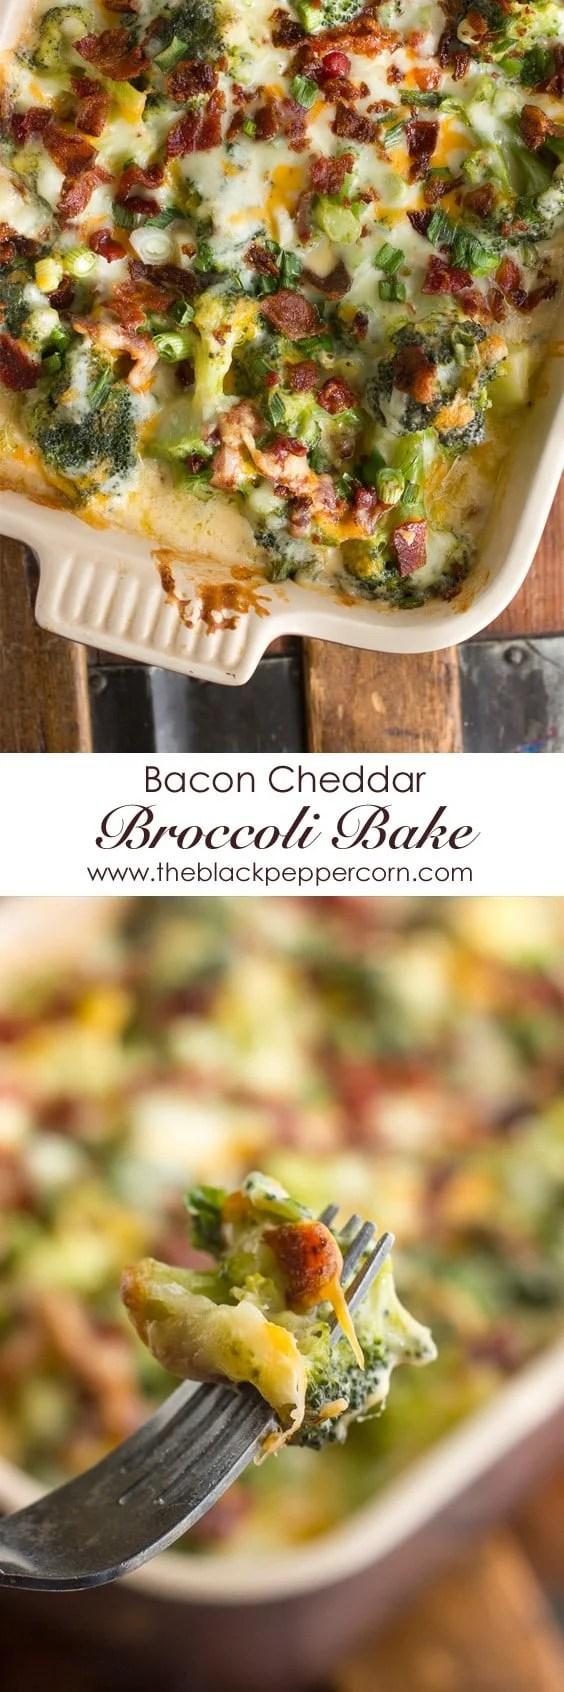 Bacon Cheddar Broccoli Bake